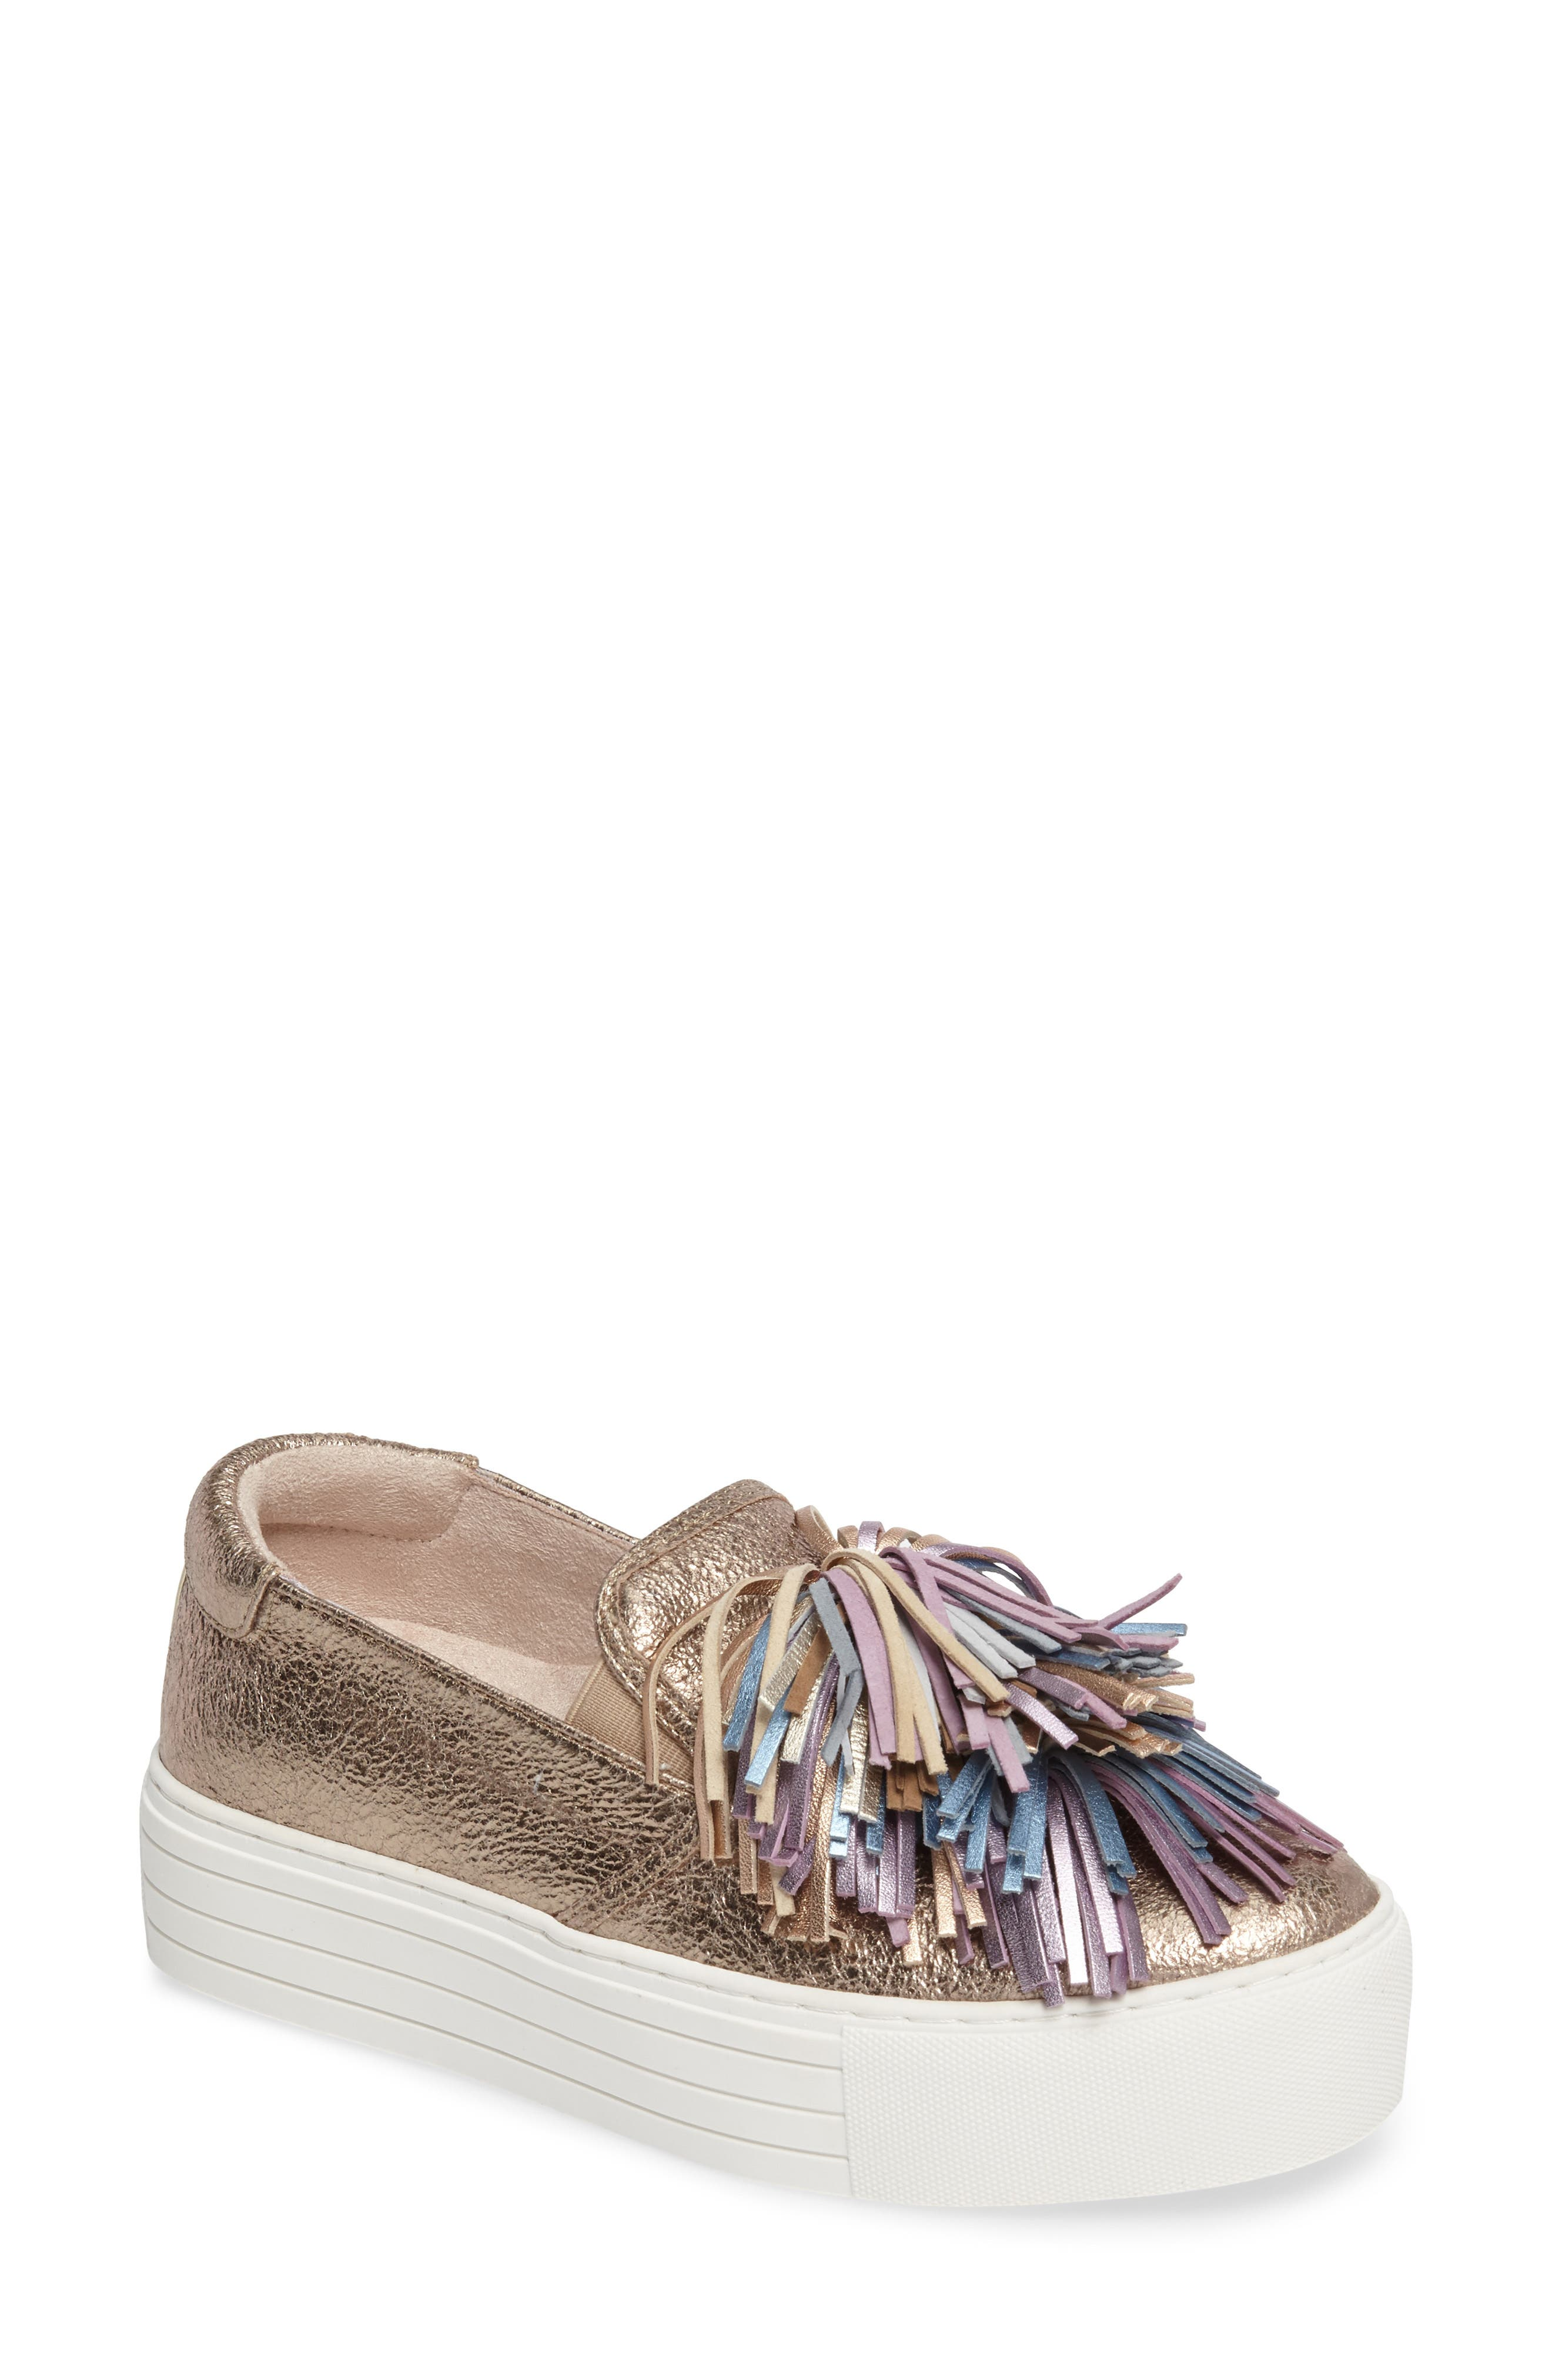 Alternate Image 1 Selected - Kenneth Cole New York Jayson Pom Platform Sneaker (Women)